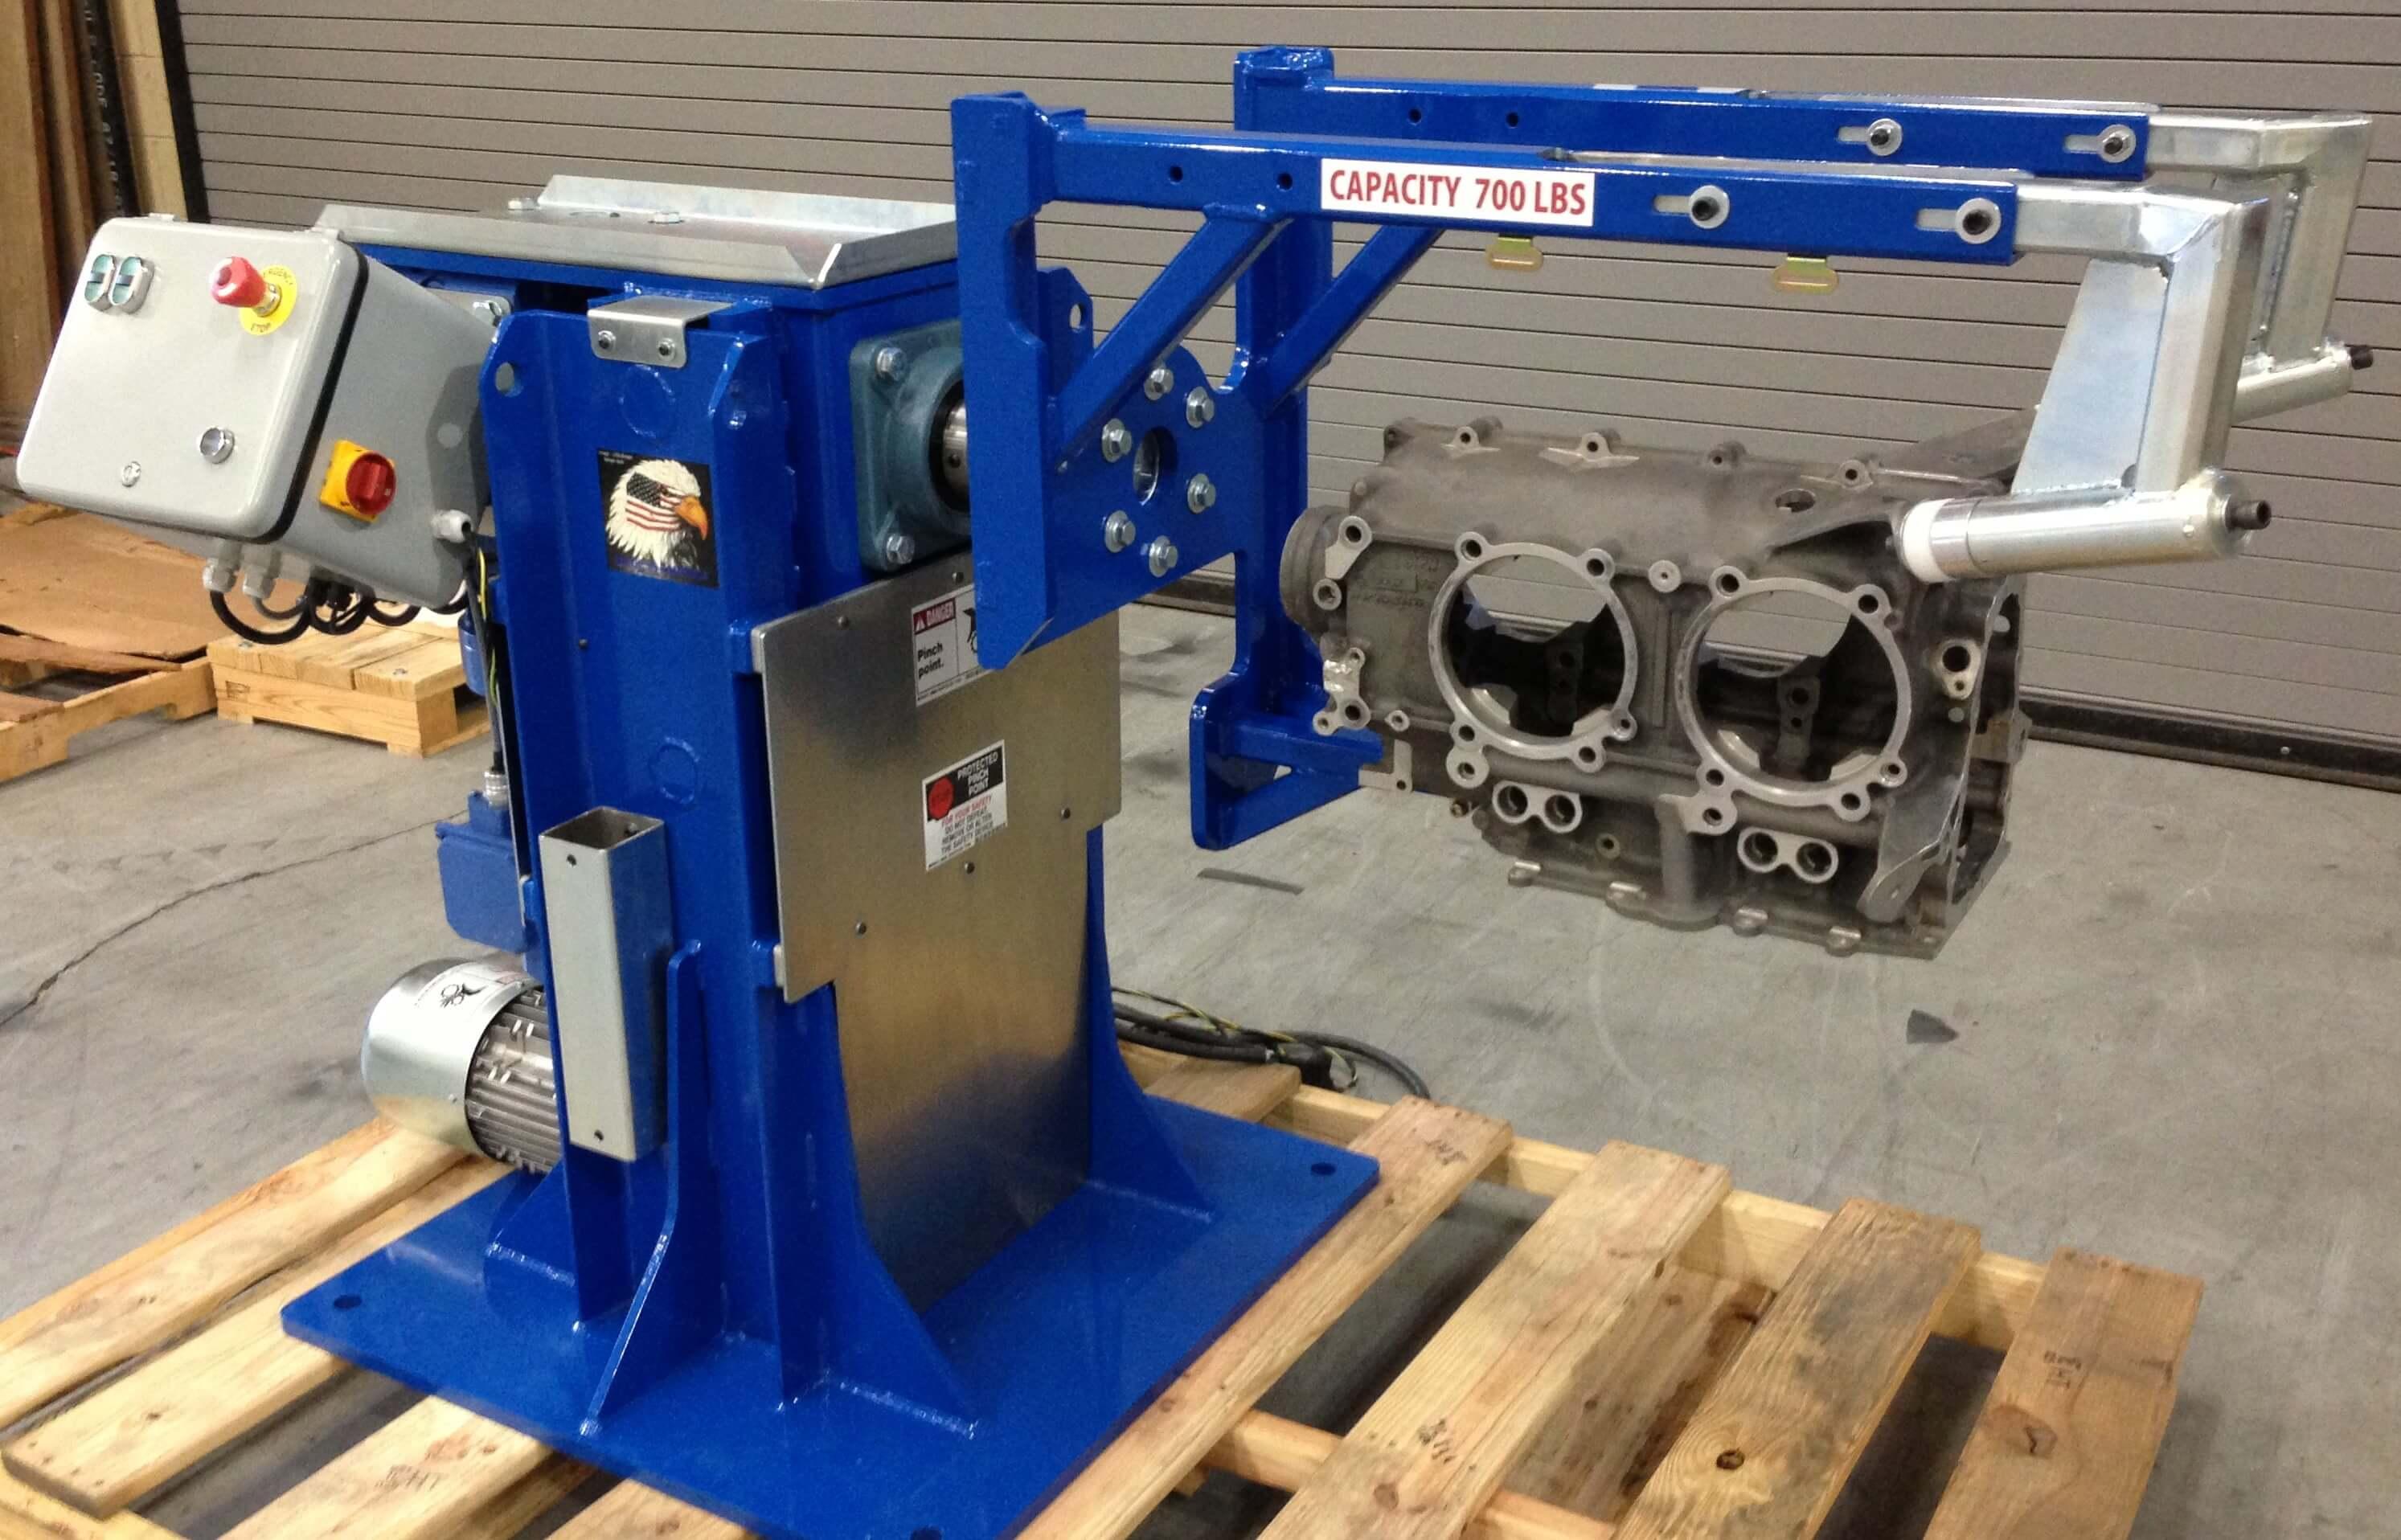 Aircraft Engine Stand being assembled